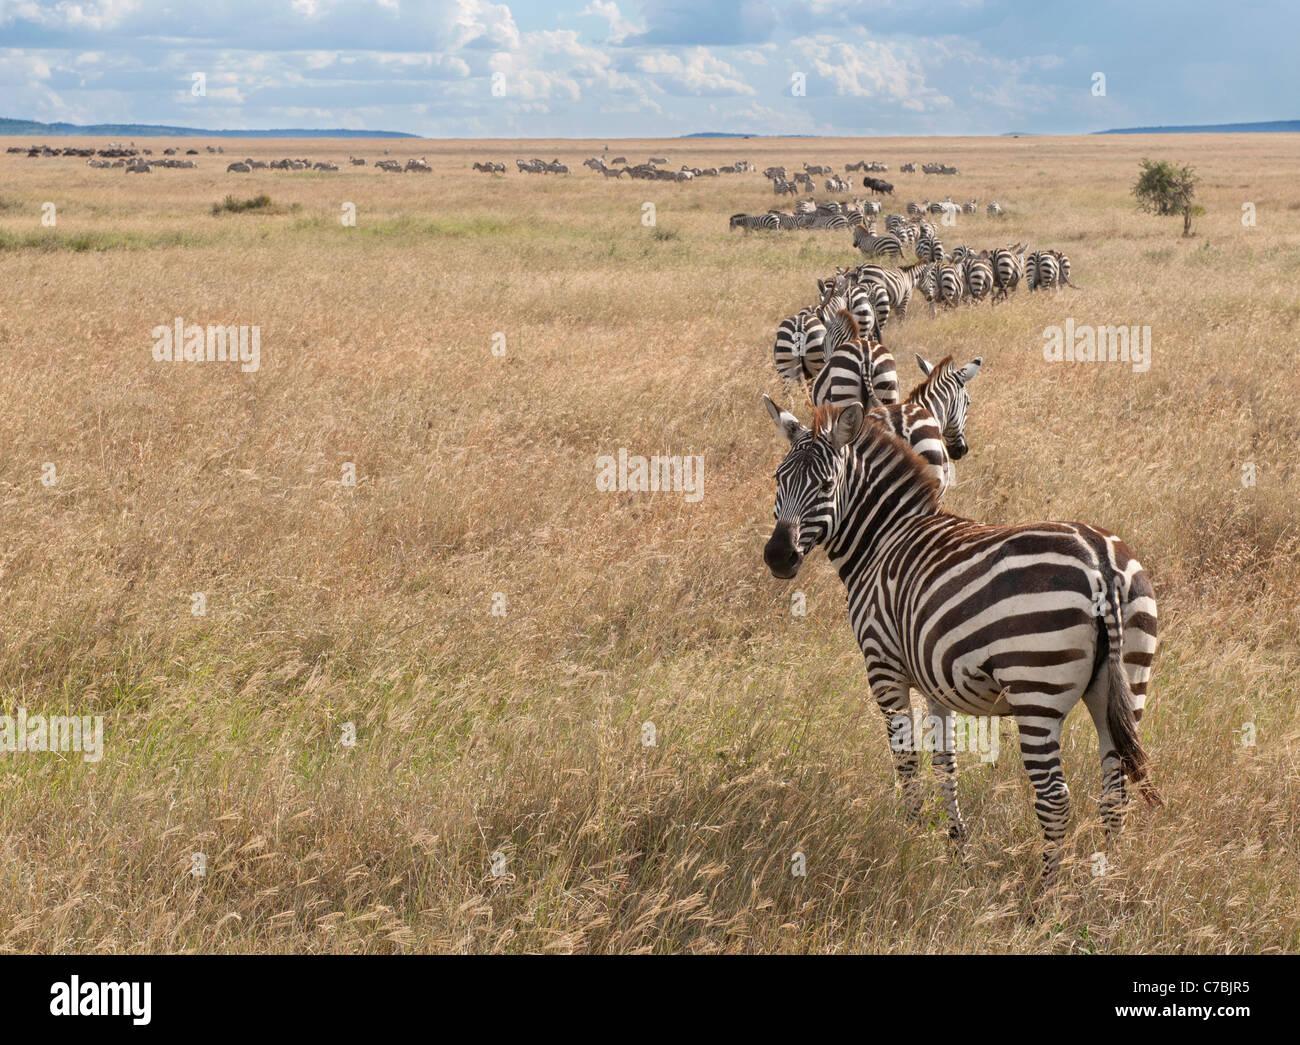 Les zèbres at The Serengeti National Park, Tanzania, Africa Photo Stock